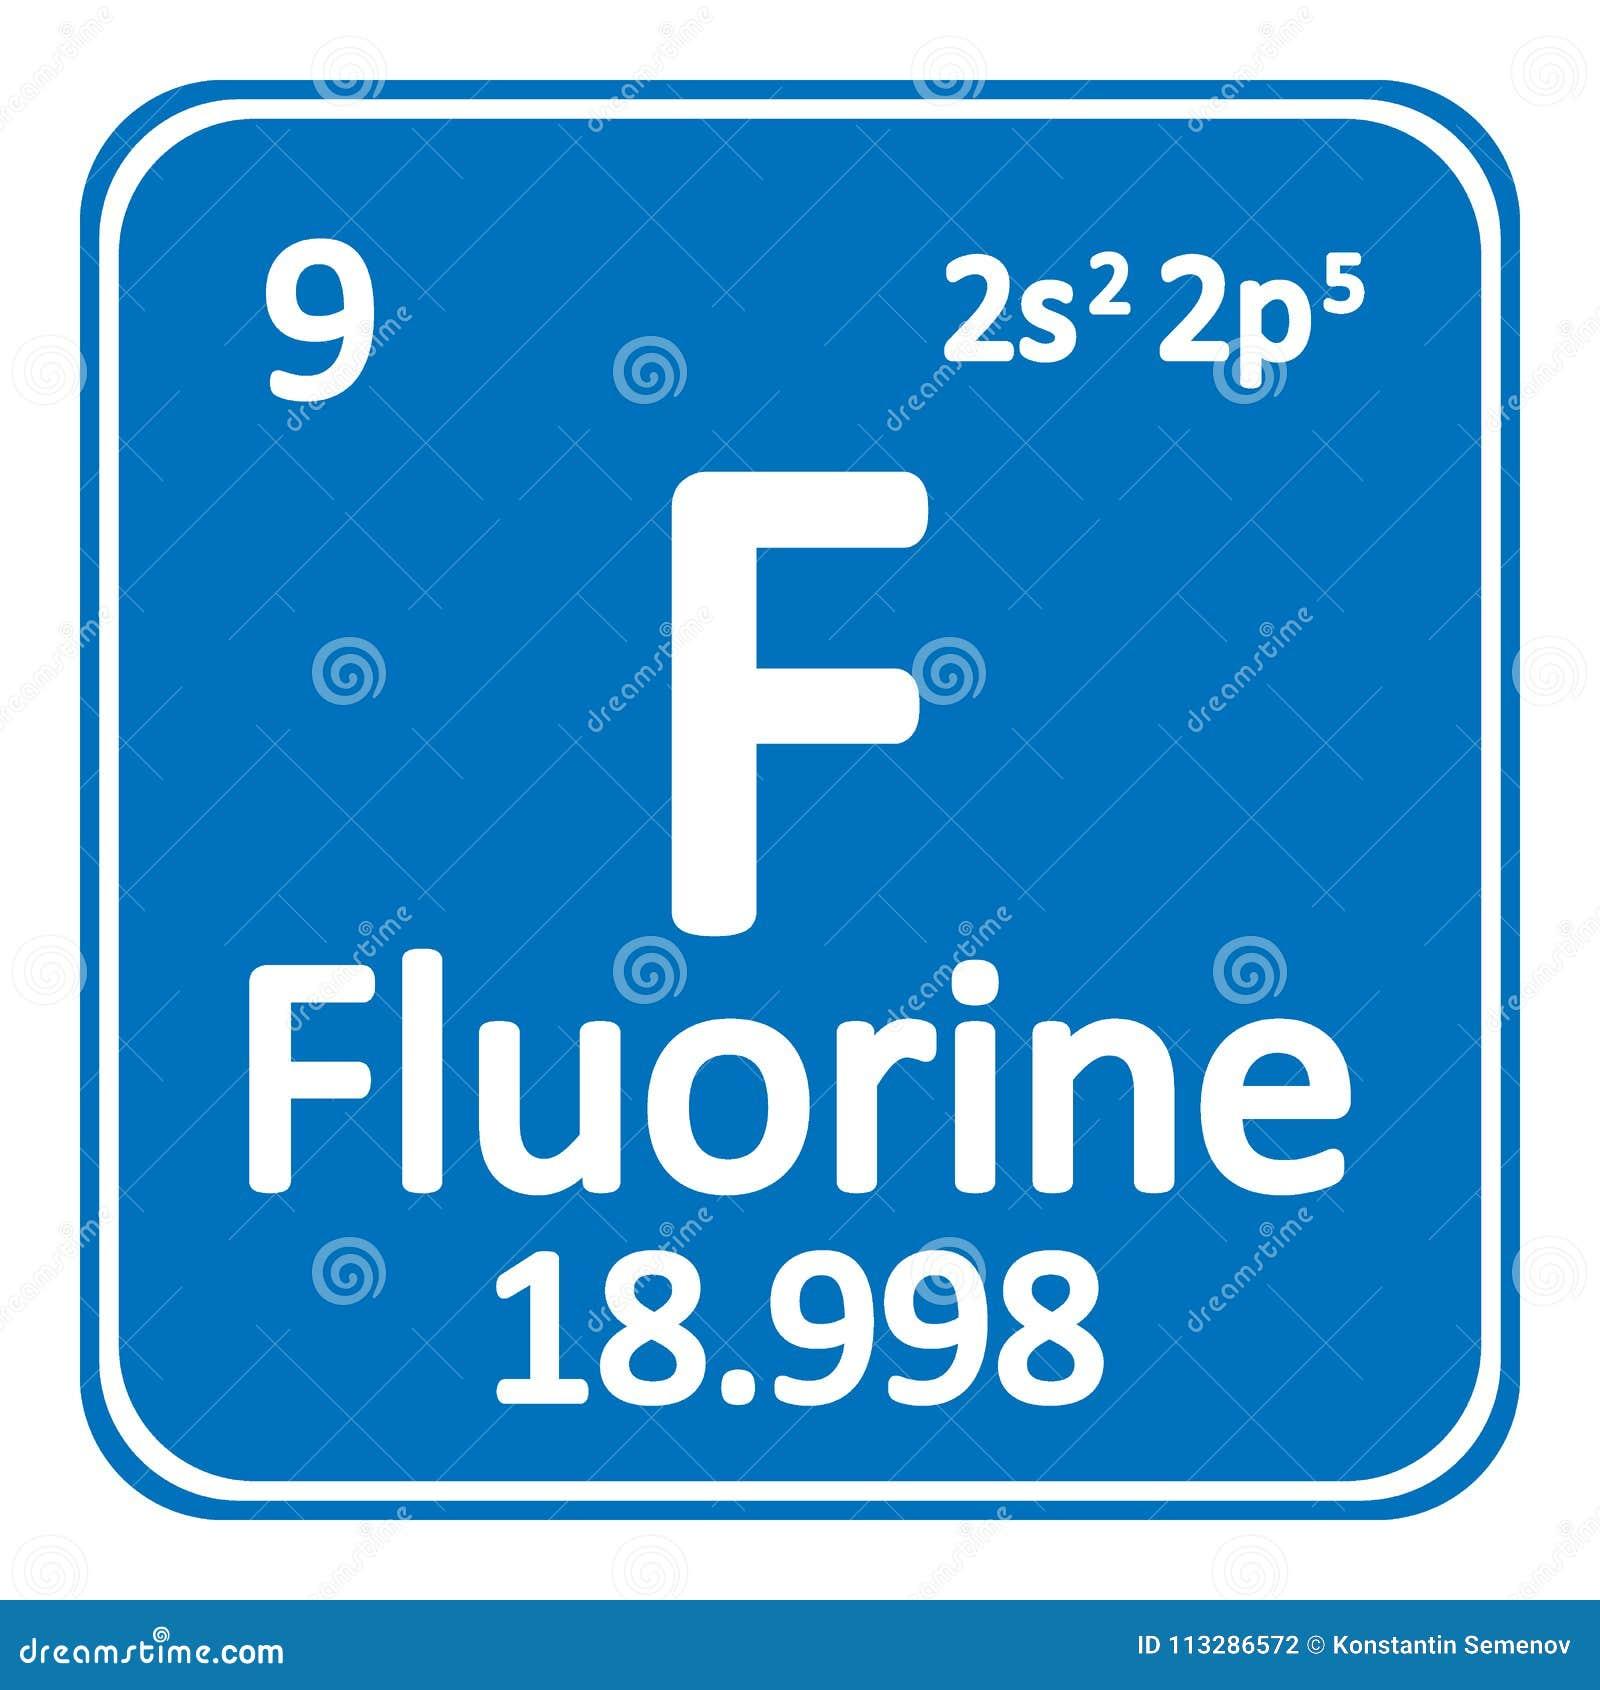 Periodic table element fluorine icon stock illustration download periodic table element fluorine icon stock illustration illustration of illustration mass urtaz Image collections